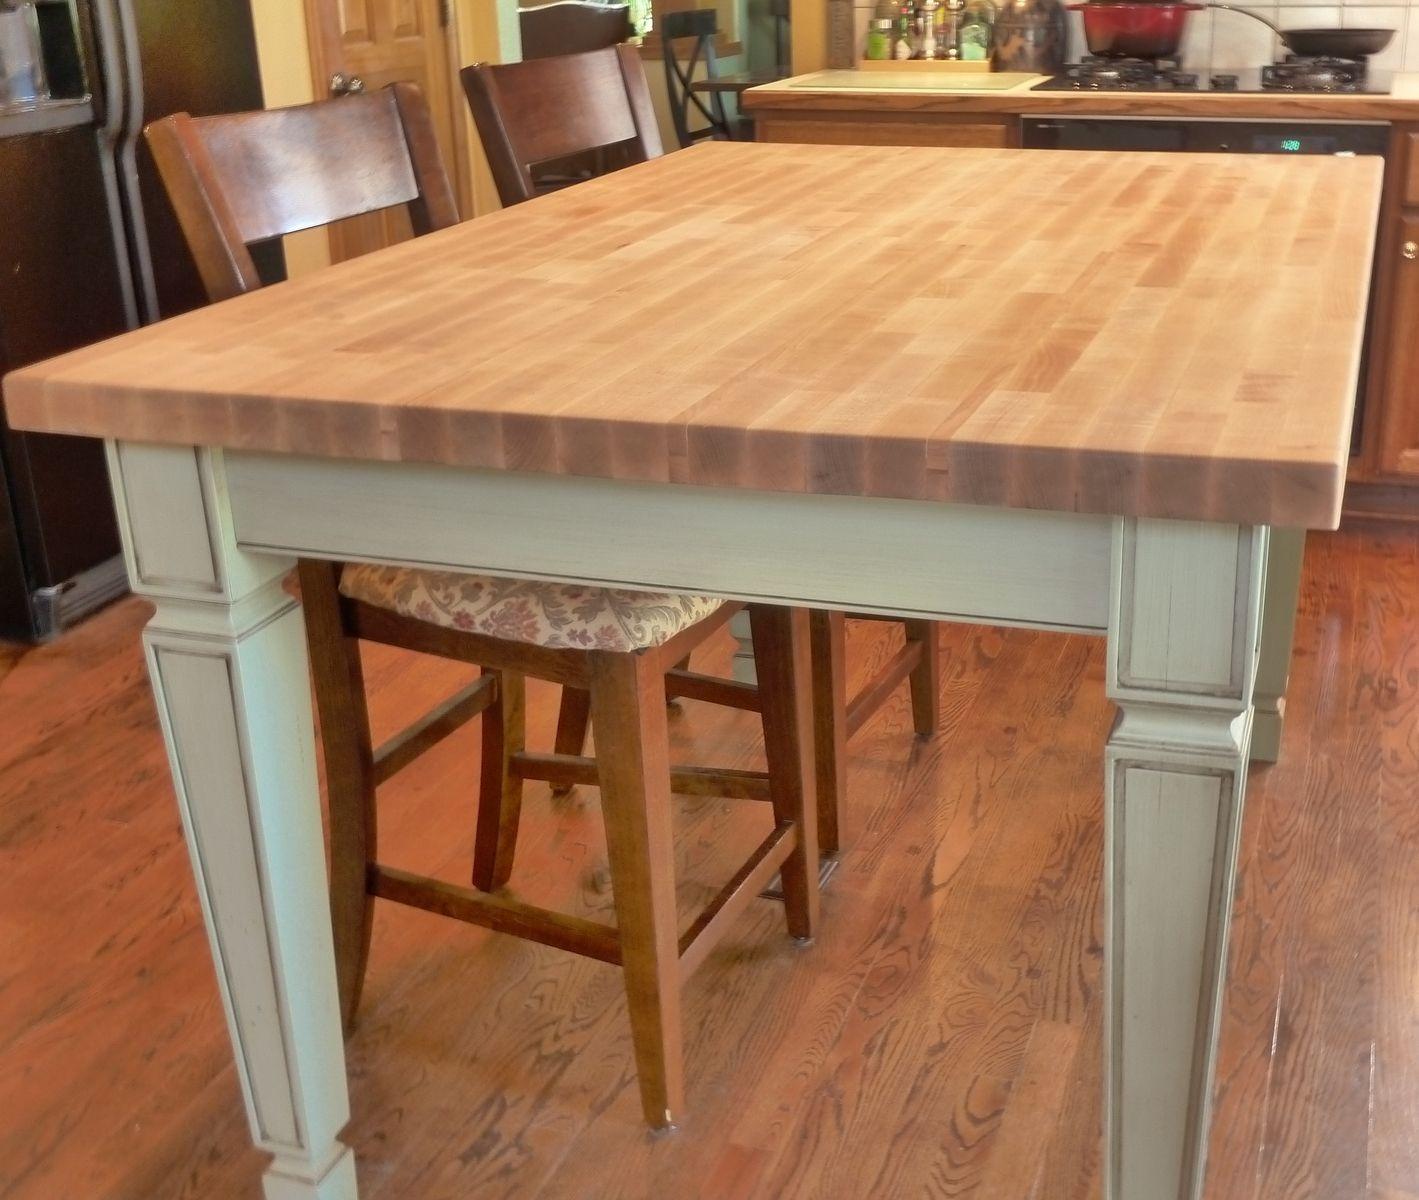 Kitchen block table kitchen backsplash design ideas check more at